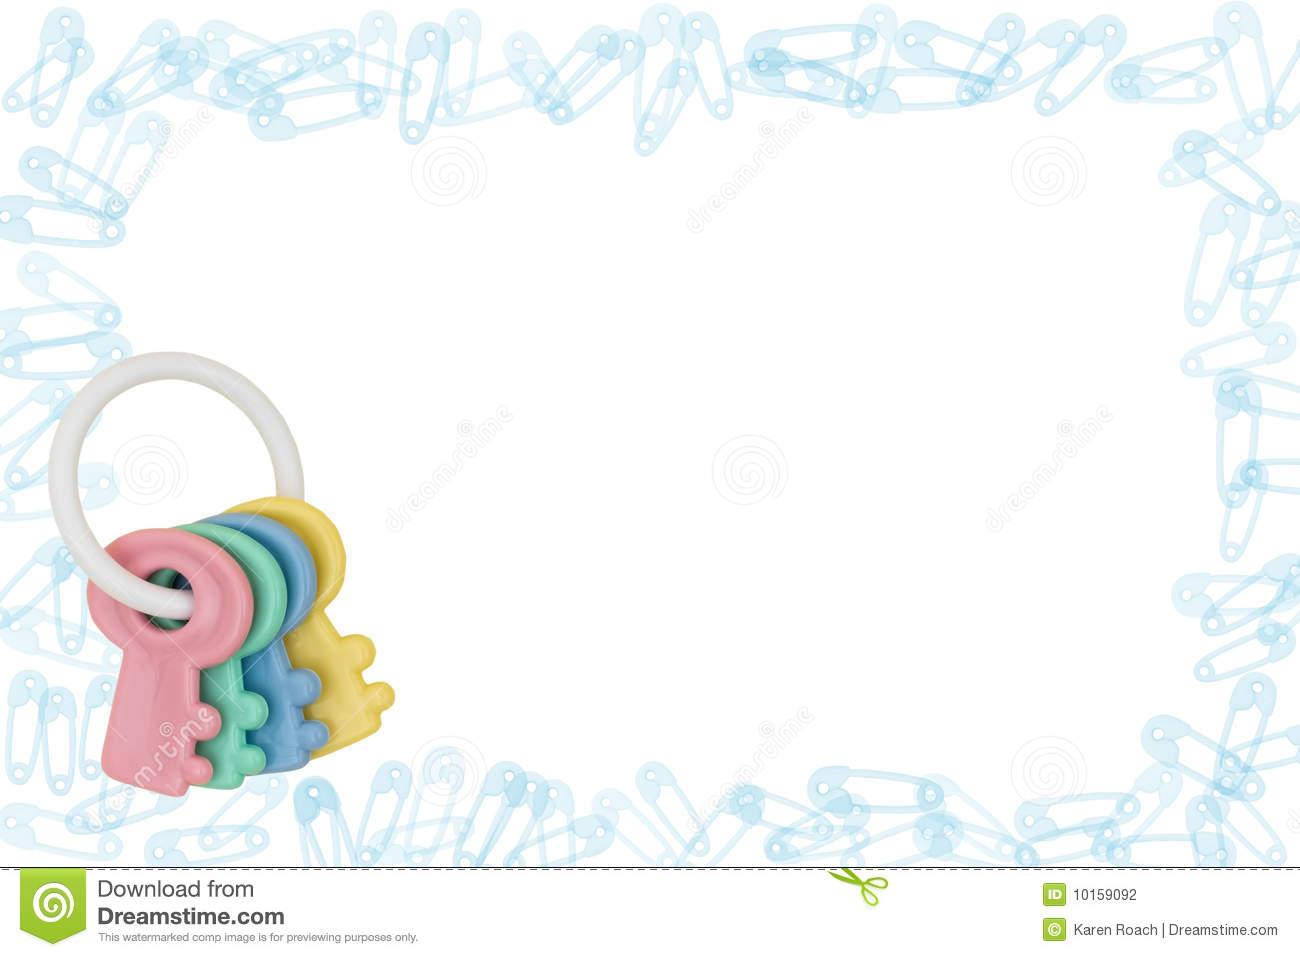 Diaper Border Clipart - Clipart Kid